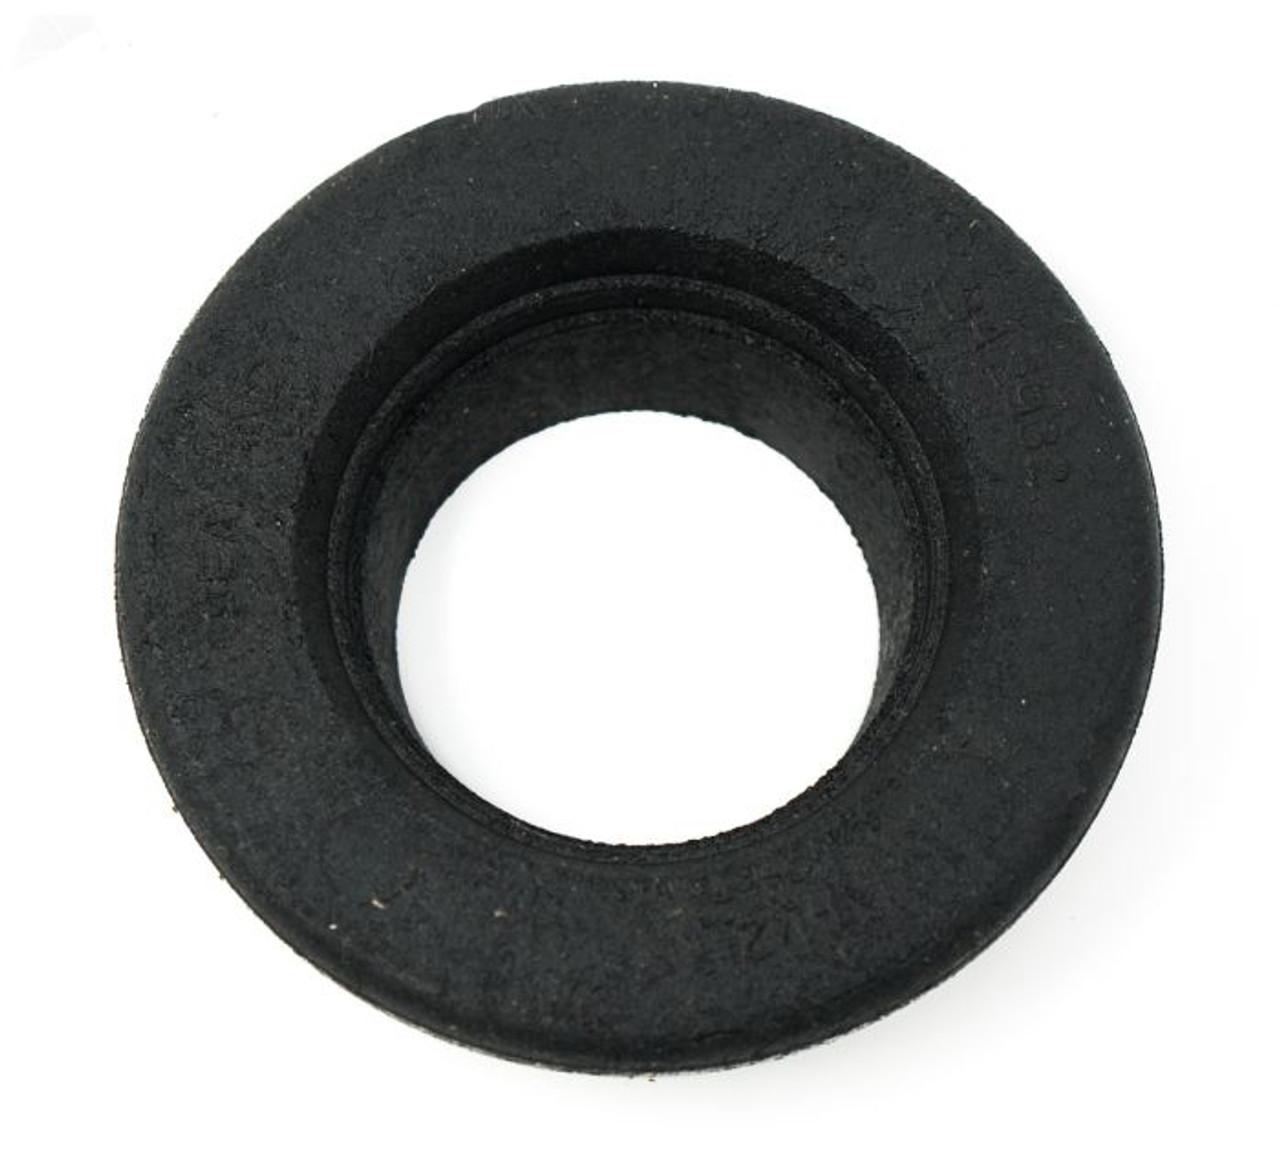 Rubber Sealing Grommet 1 1/2 Inch - 342932 - 311111 - 311838